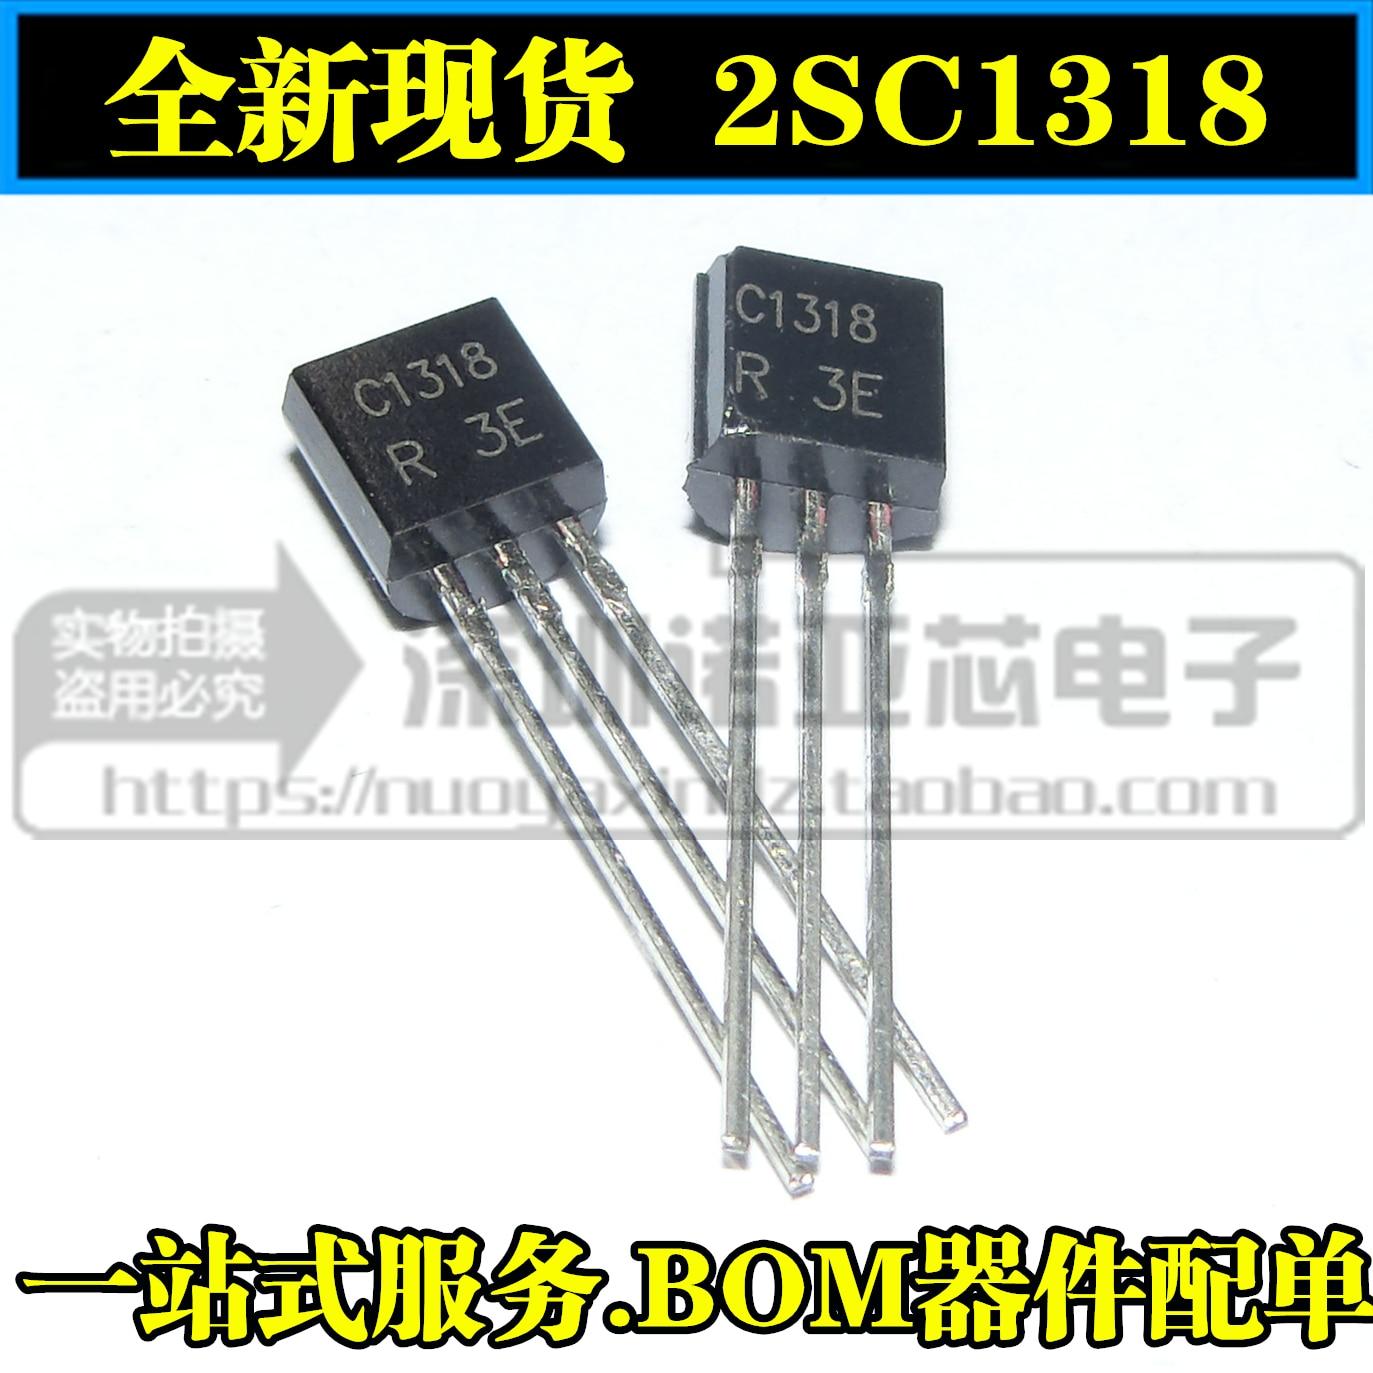 100pcs/lot New 2SC1318 C1318 Transistor TO-92